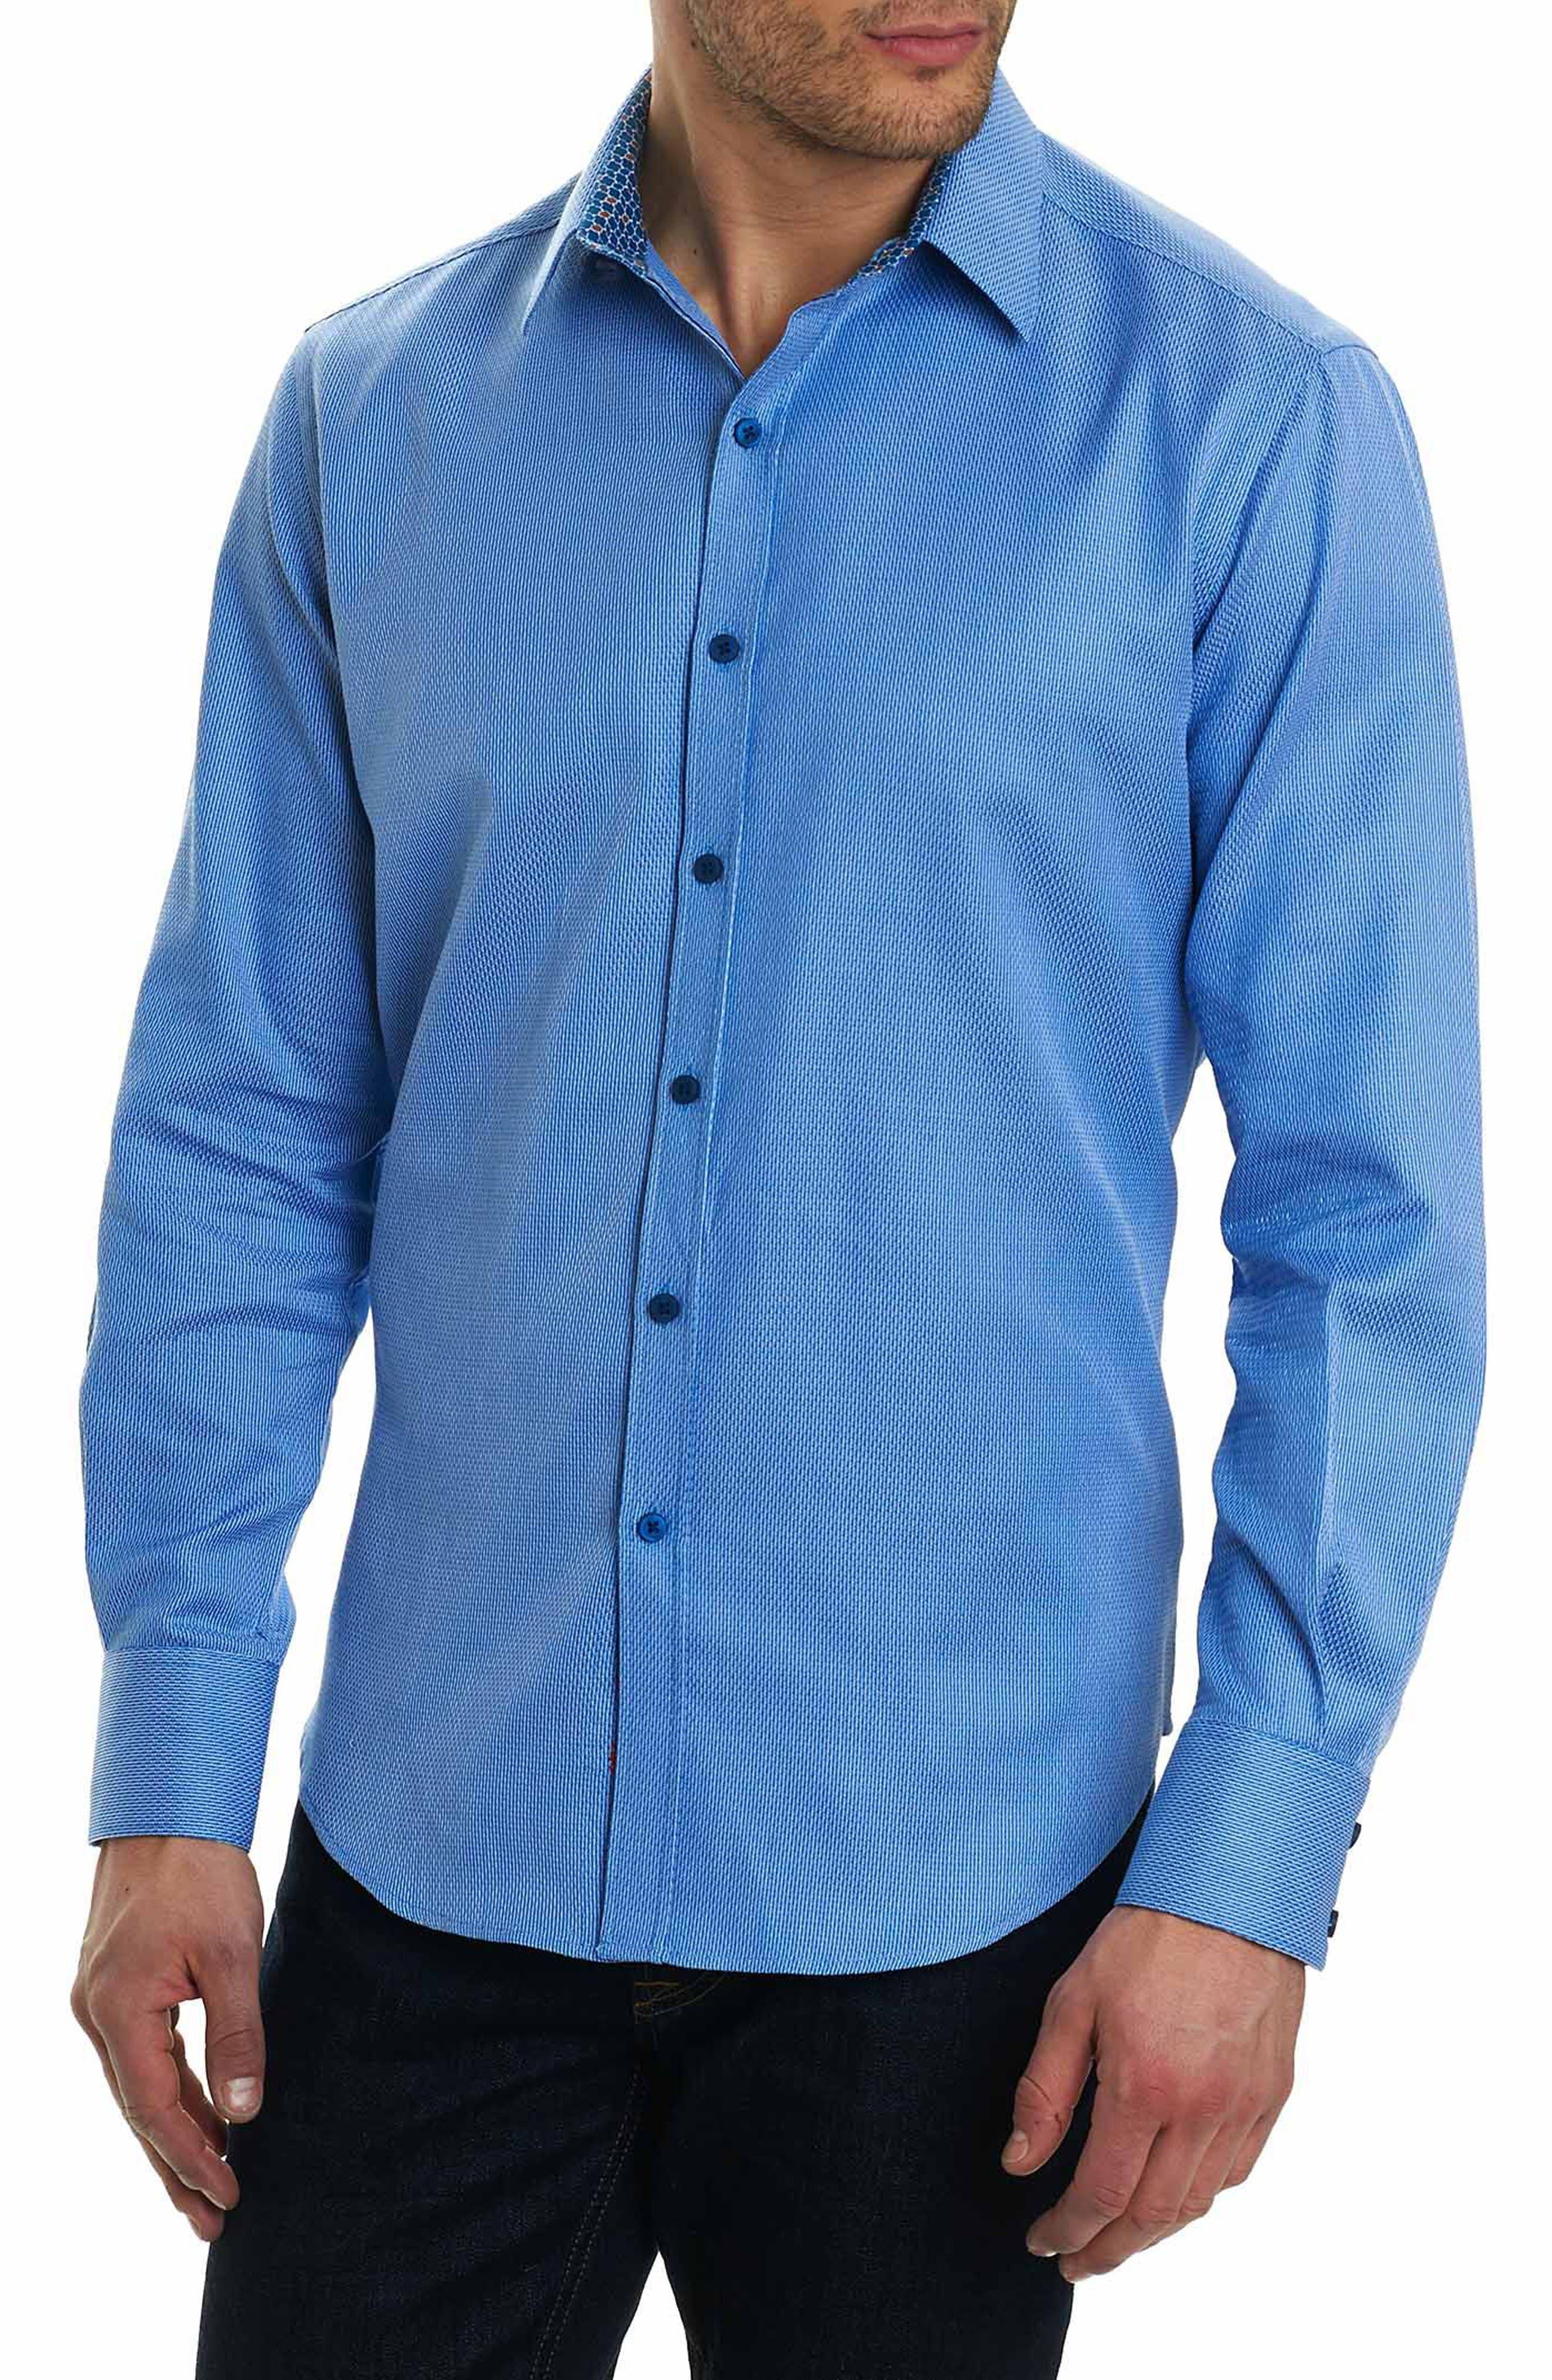 Jobson Classic Fit Sport Shirt,                         Main,                         color, 400